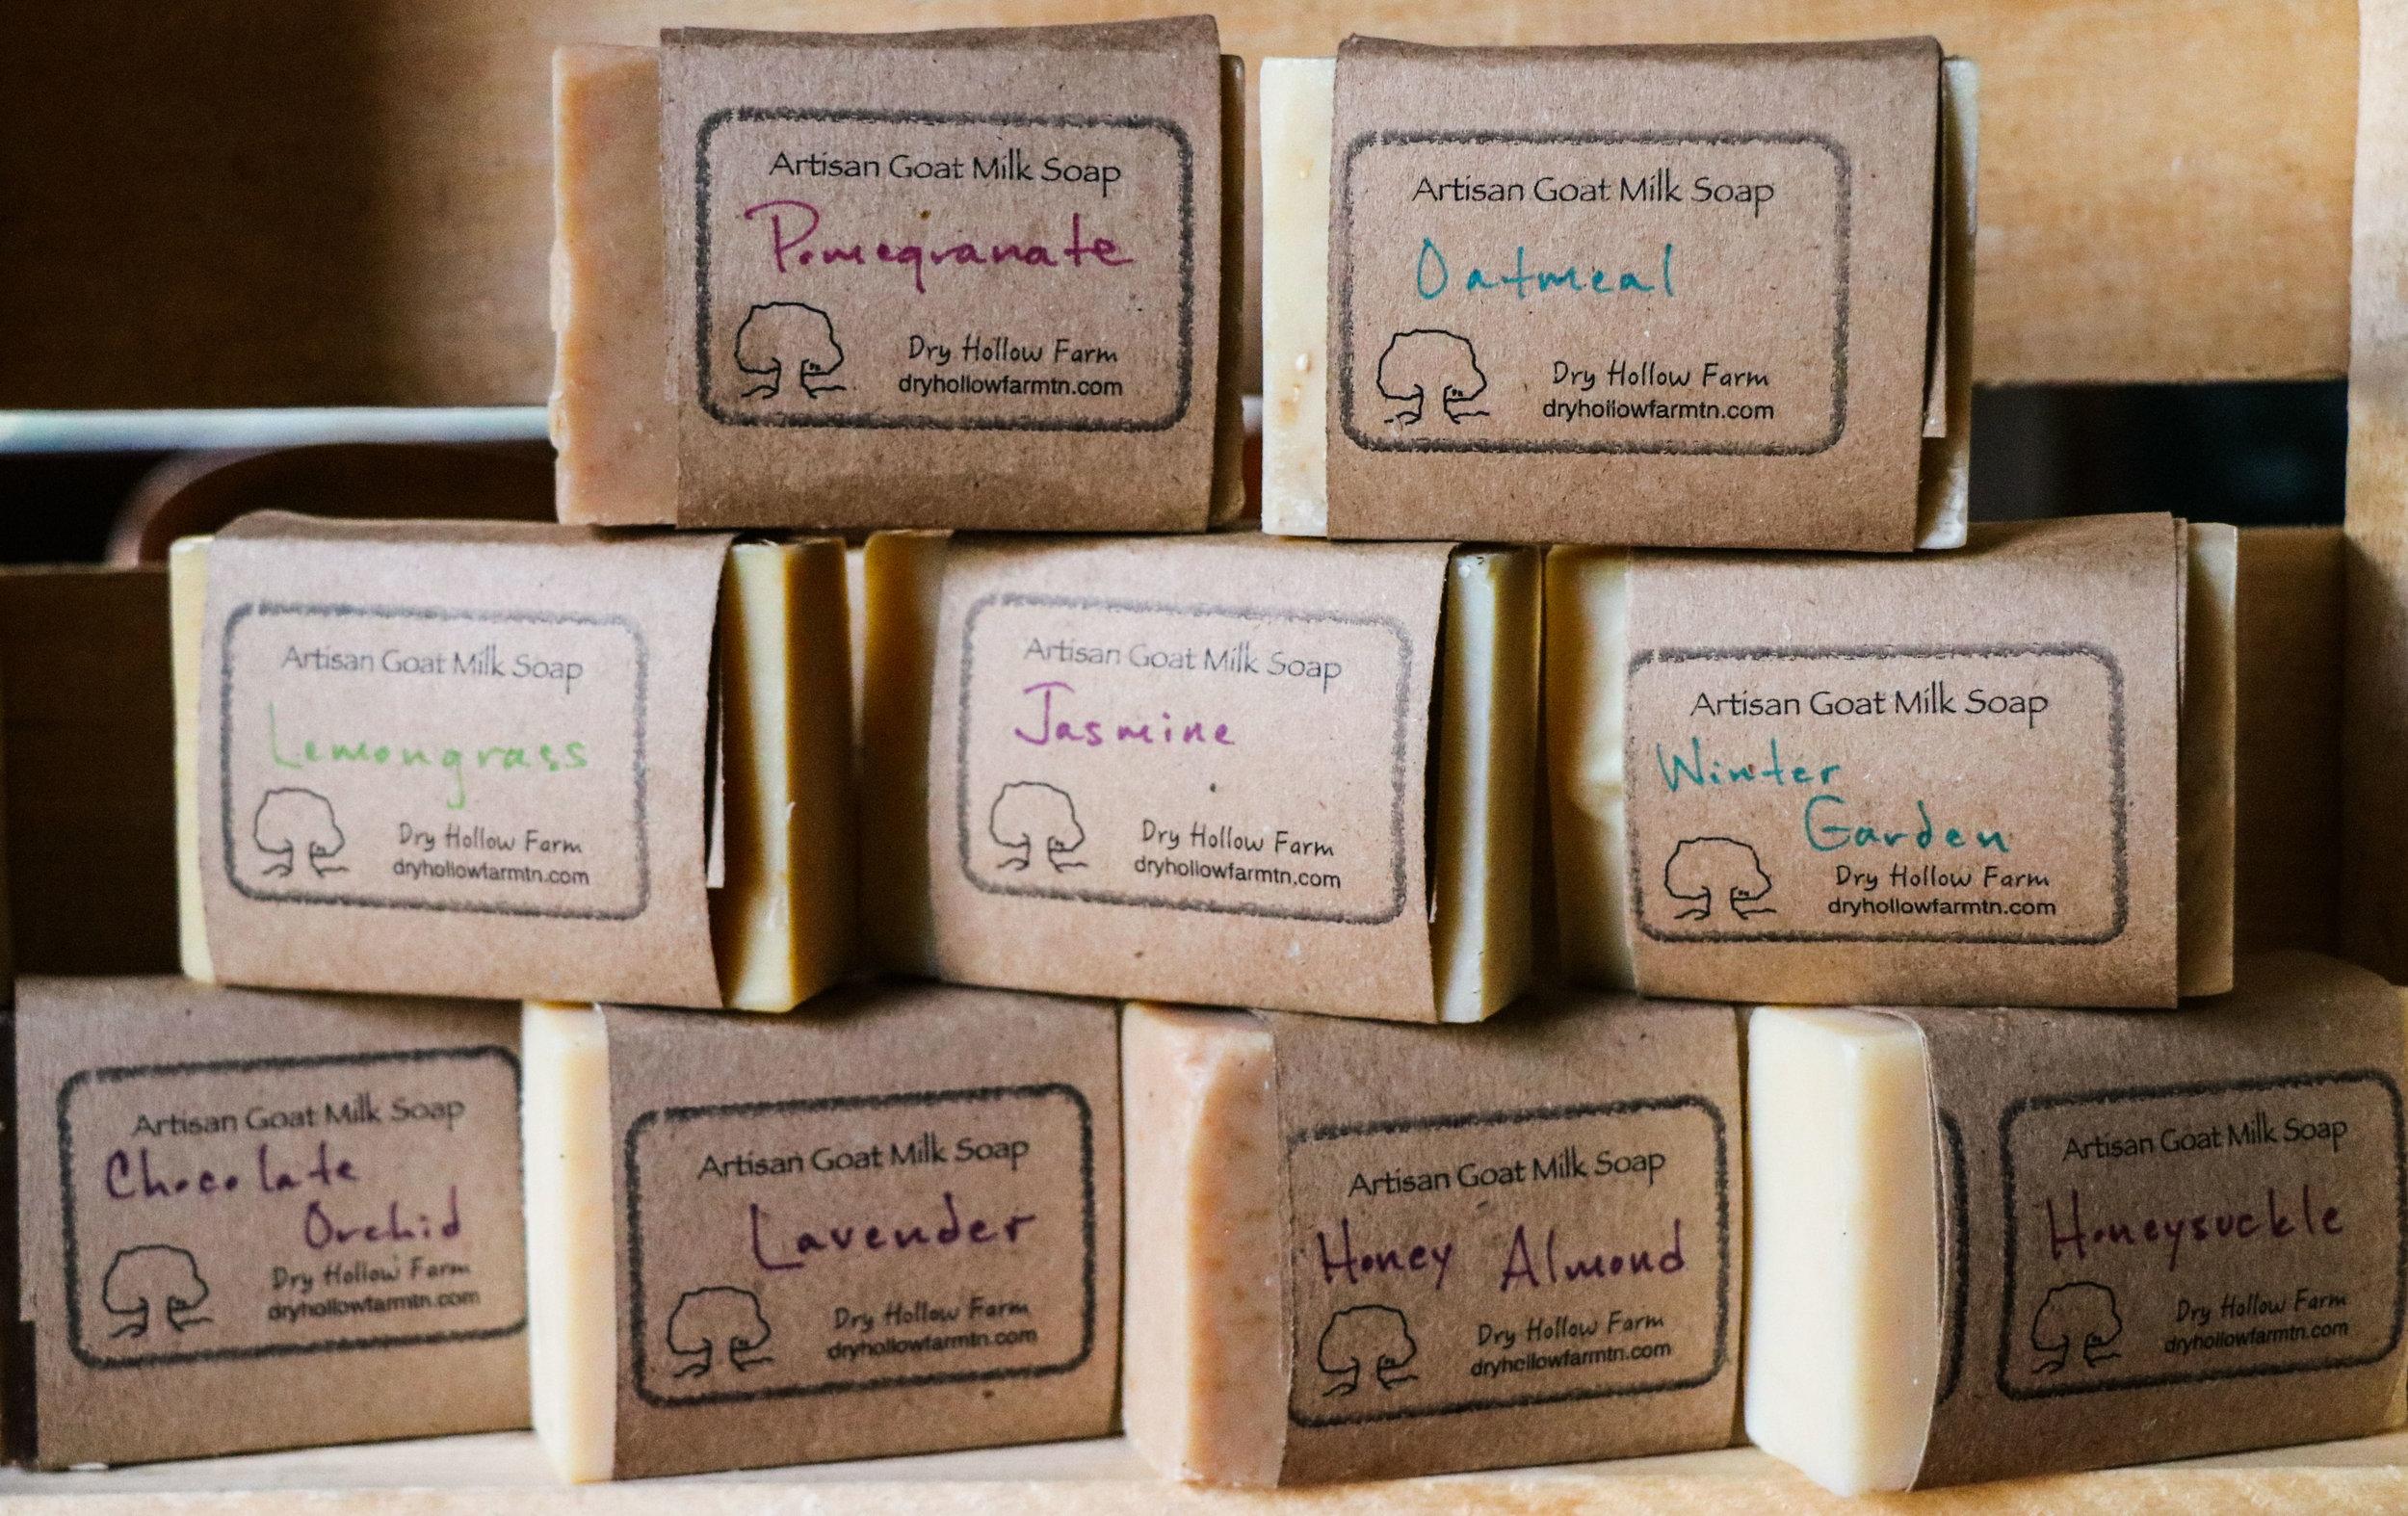 Artisan Goat Milk Soap